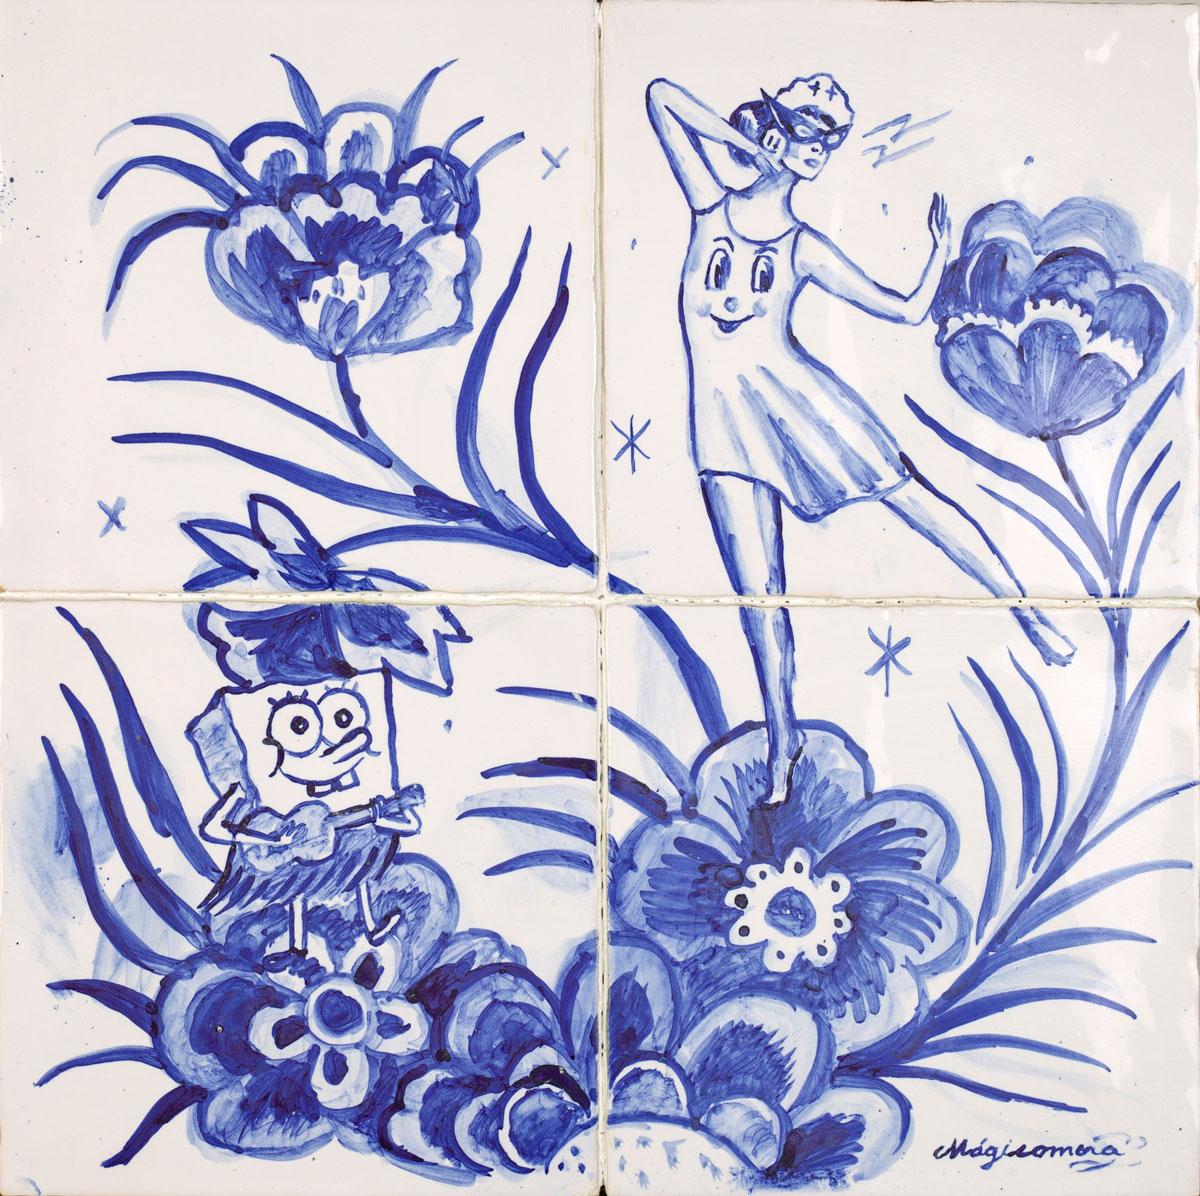 Sergio Mora, Hula Time, 2020, smalto su azulejos, 30x30 cm